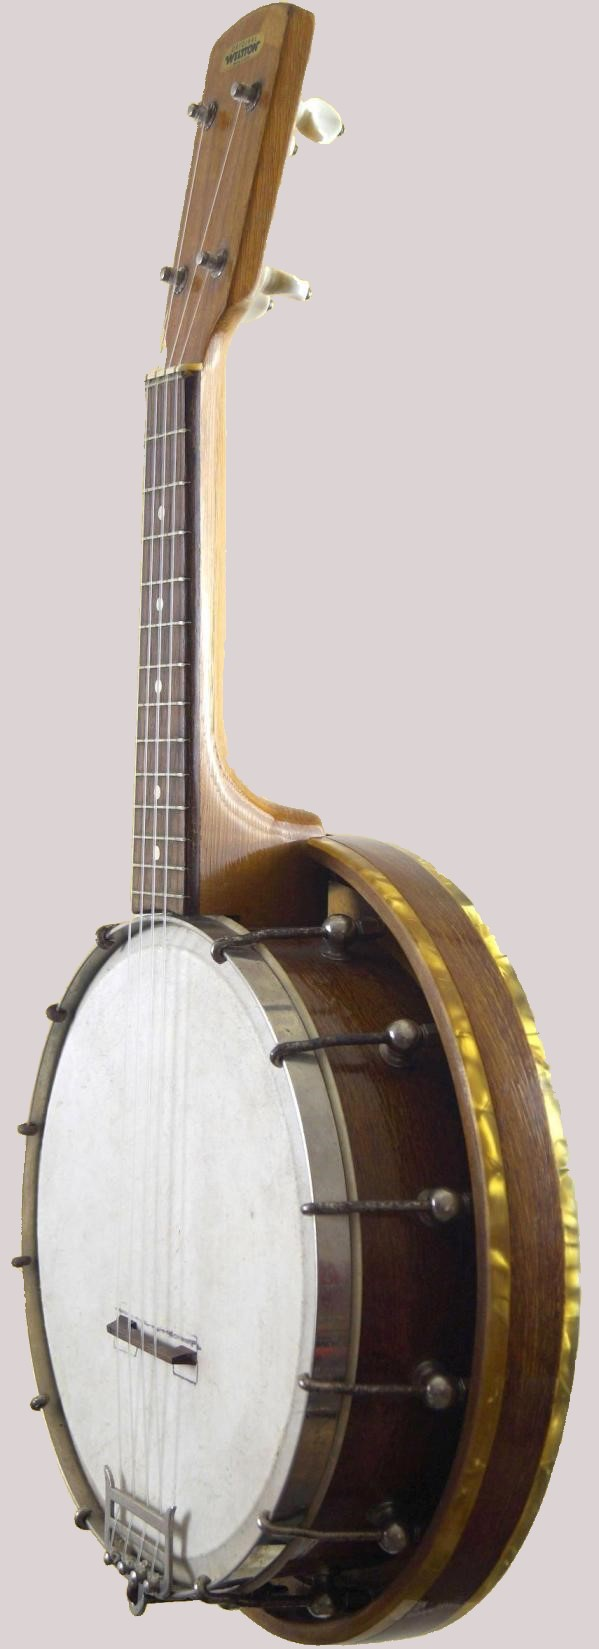 DDR banjolin banjo mandolin at Ukulele corner